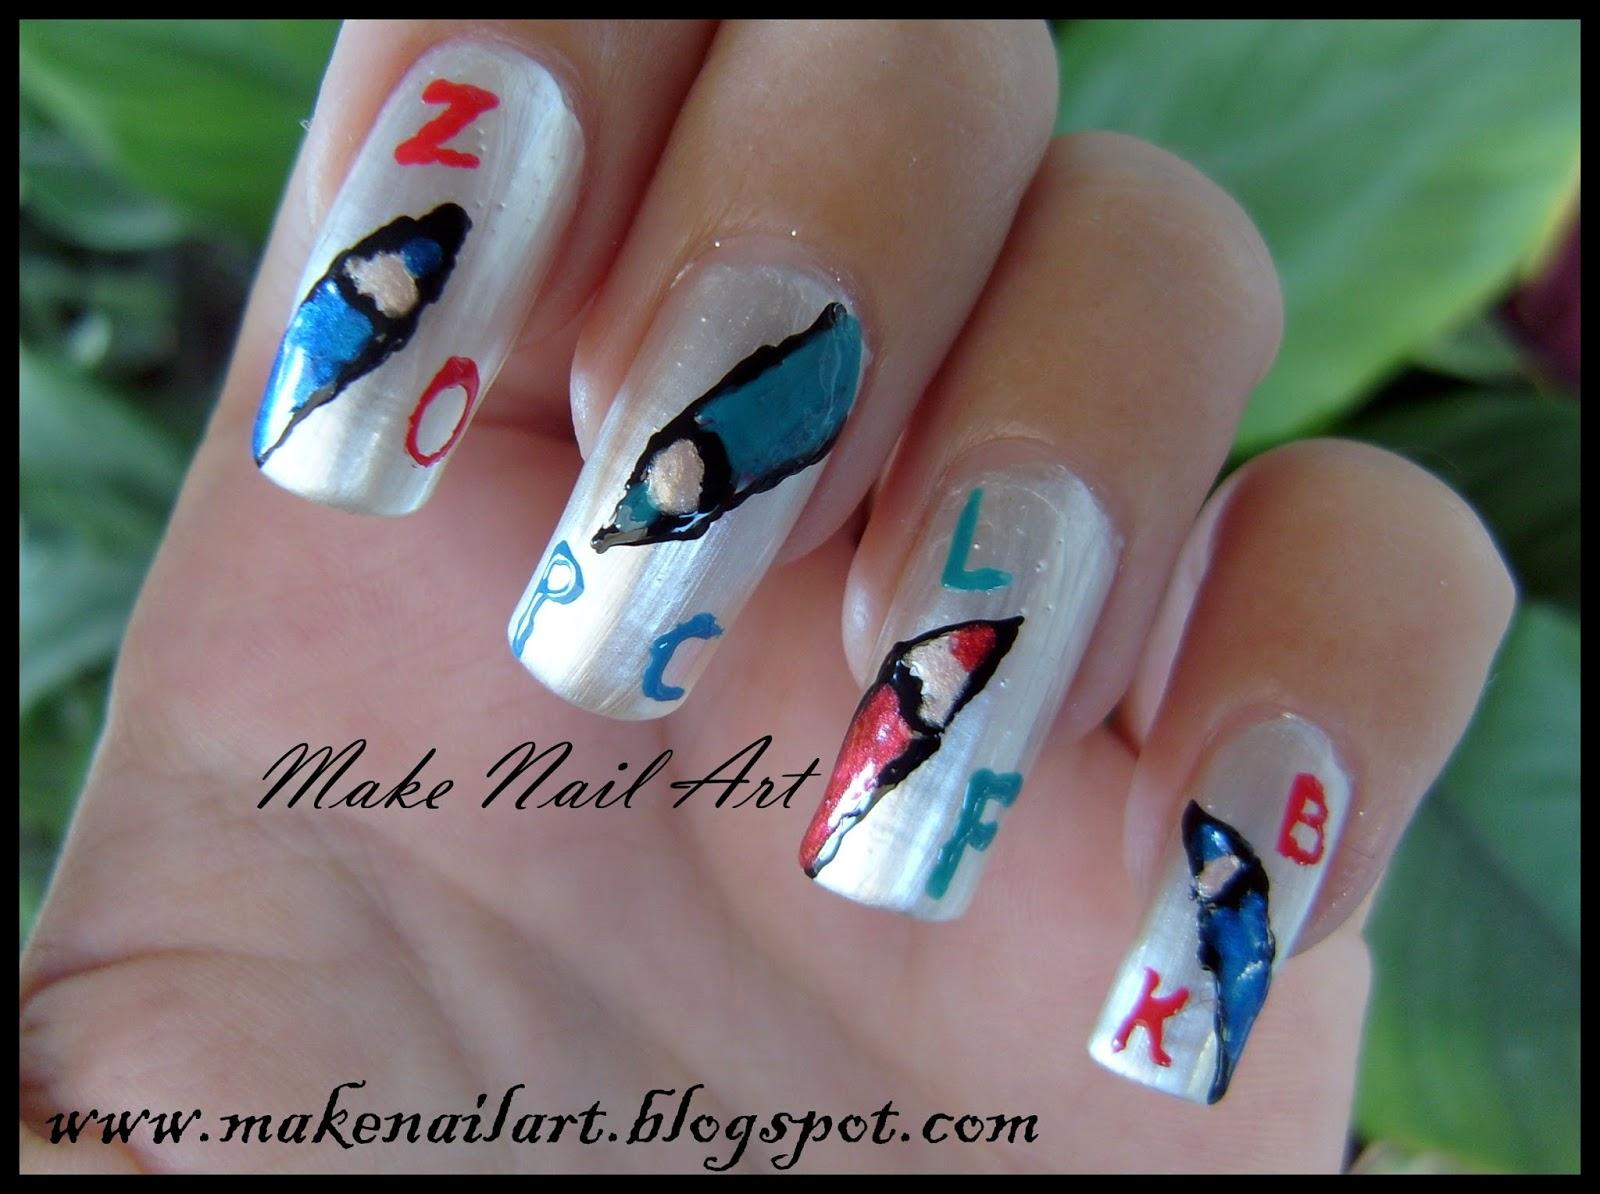 Make Nail Art: July 2013